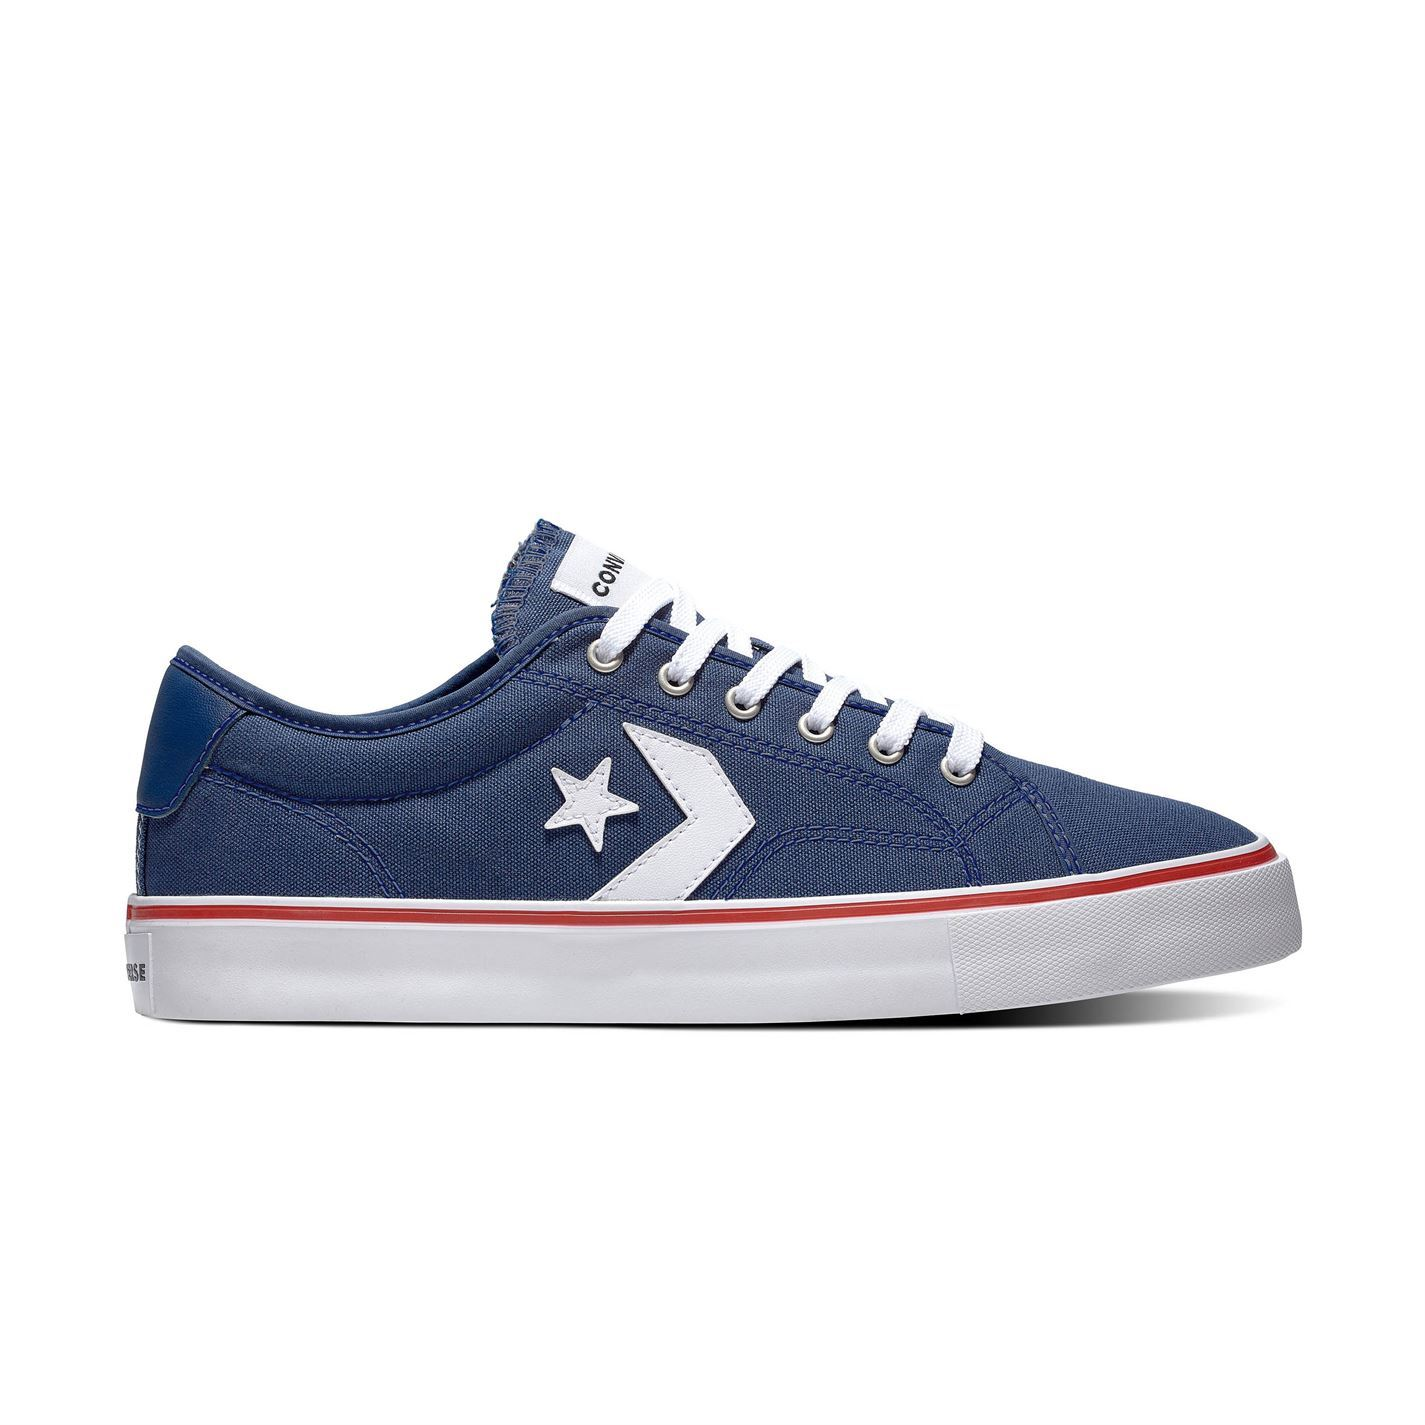 Converse-Ox-REPLAY-Baskets-Pour-Homme-Chaussures-De-Loisirs-Chaussures-Baskets miniature 14